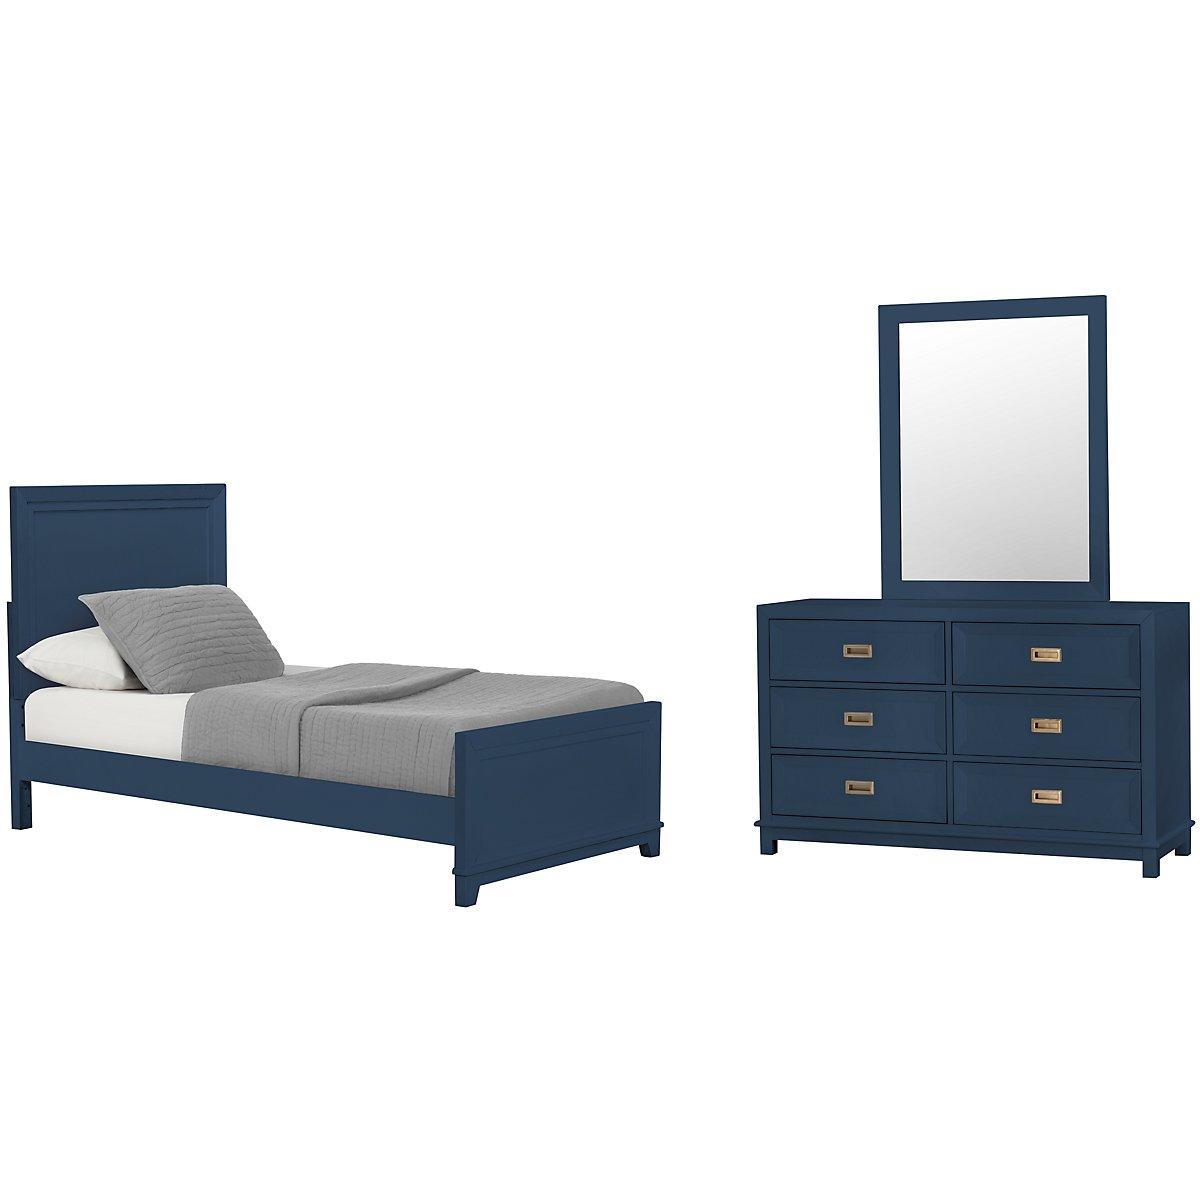 Ryder Dark Blue Panel Bedroom